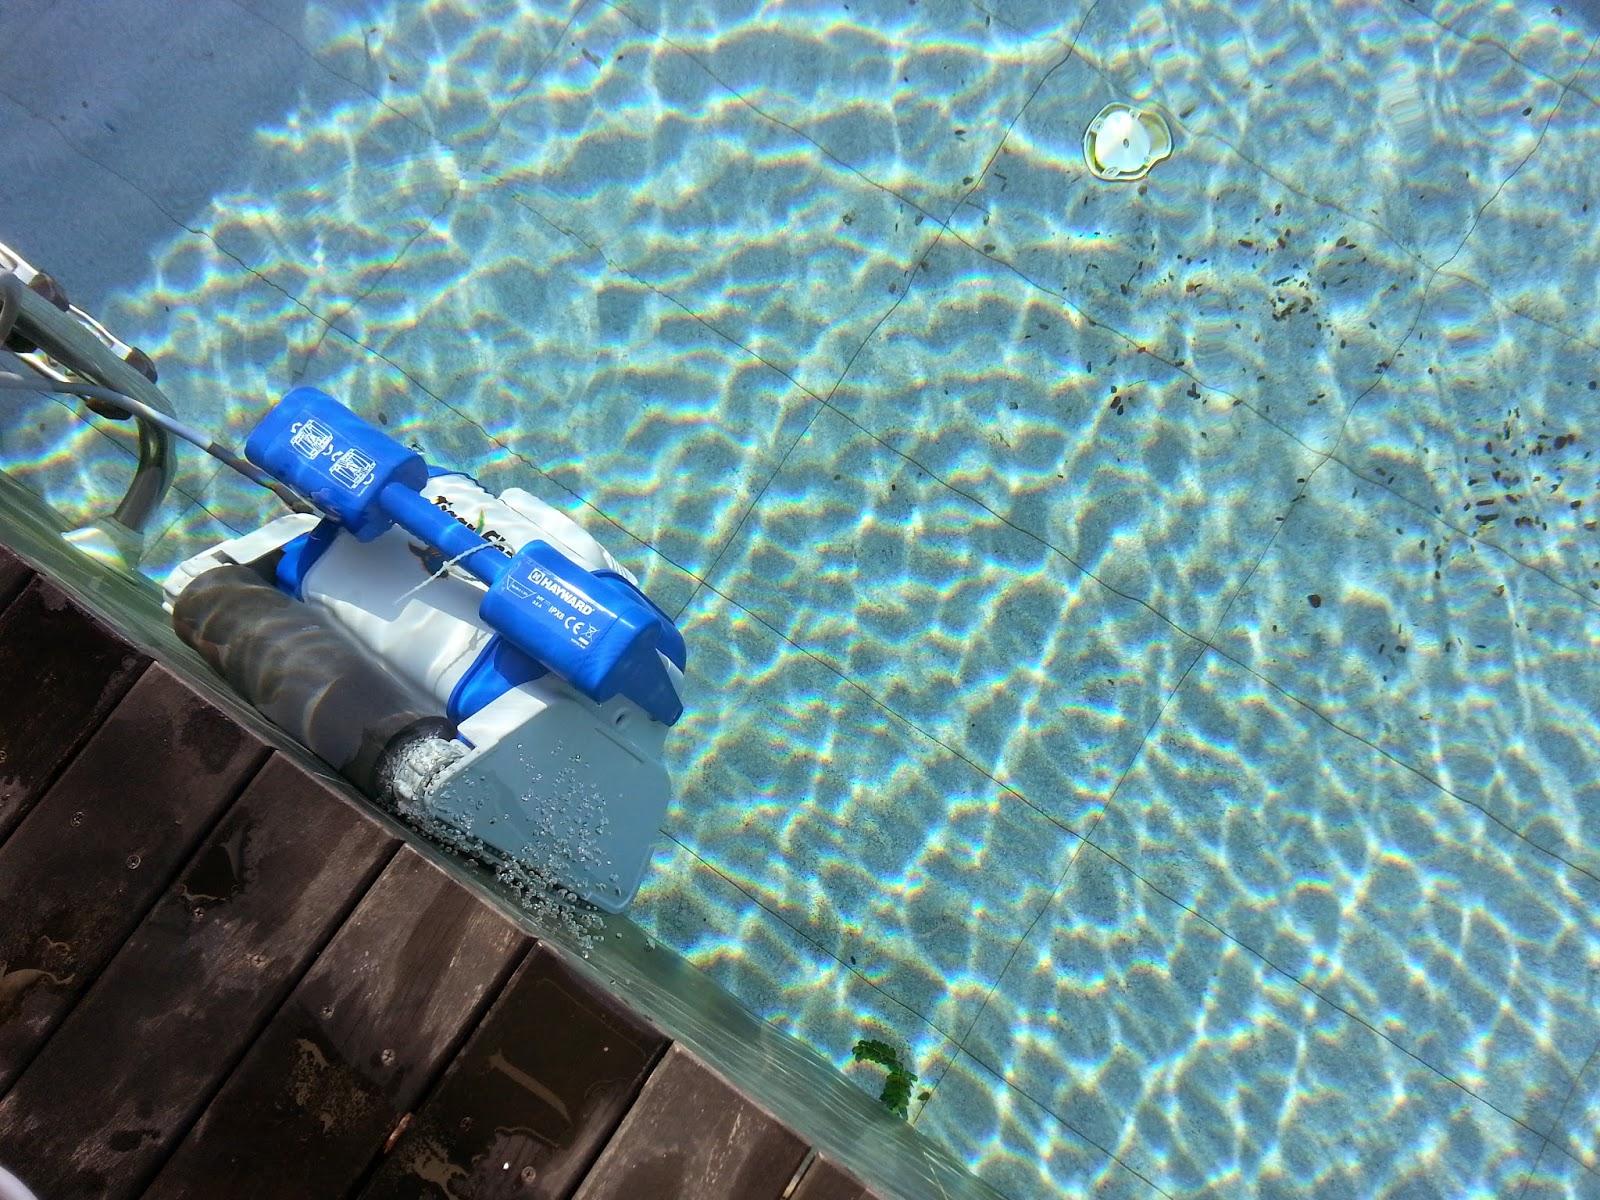 petunialee the tiger shark robot pool cleaner. Black Bedroom Furniture Sets. Home Design Ideas